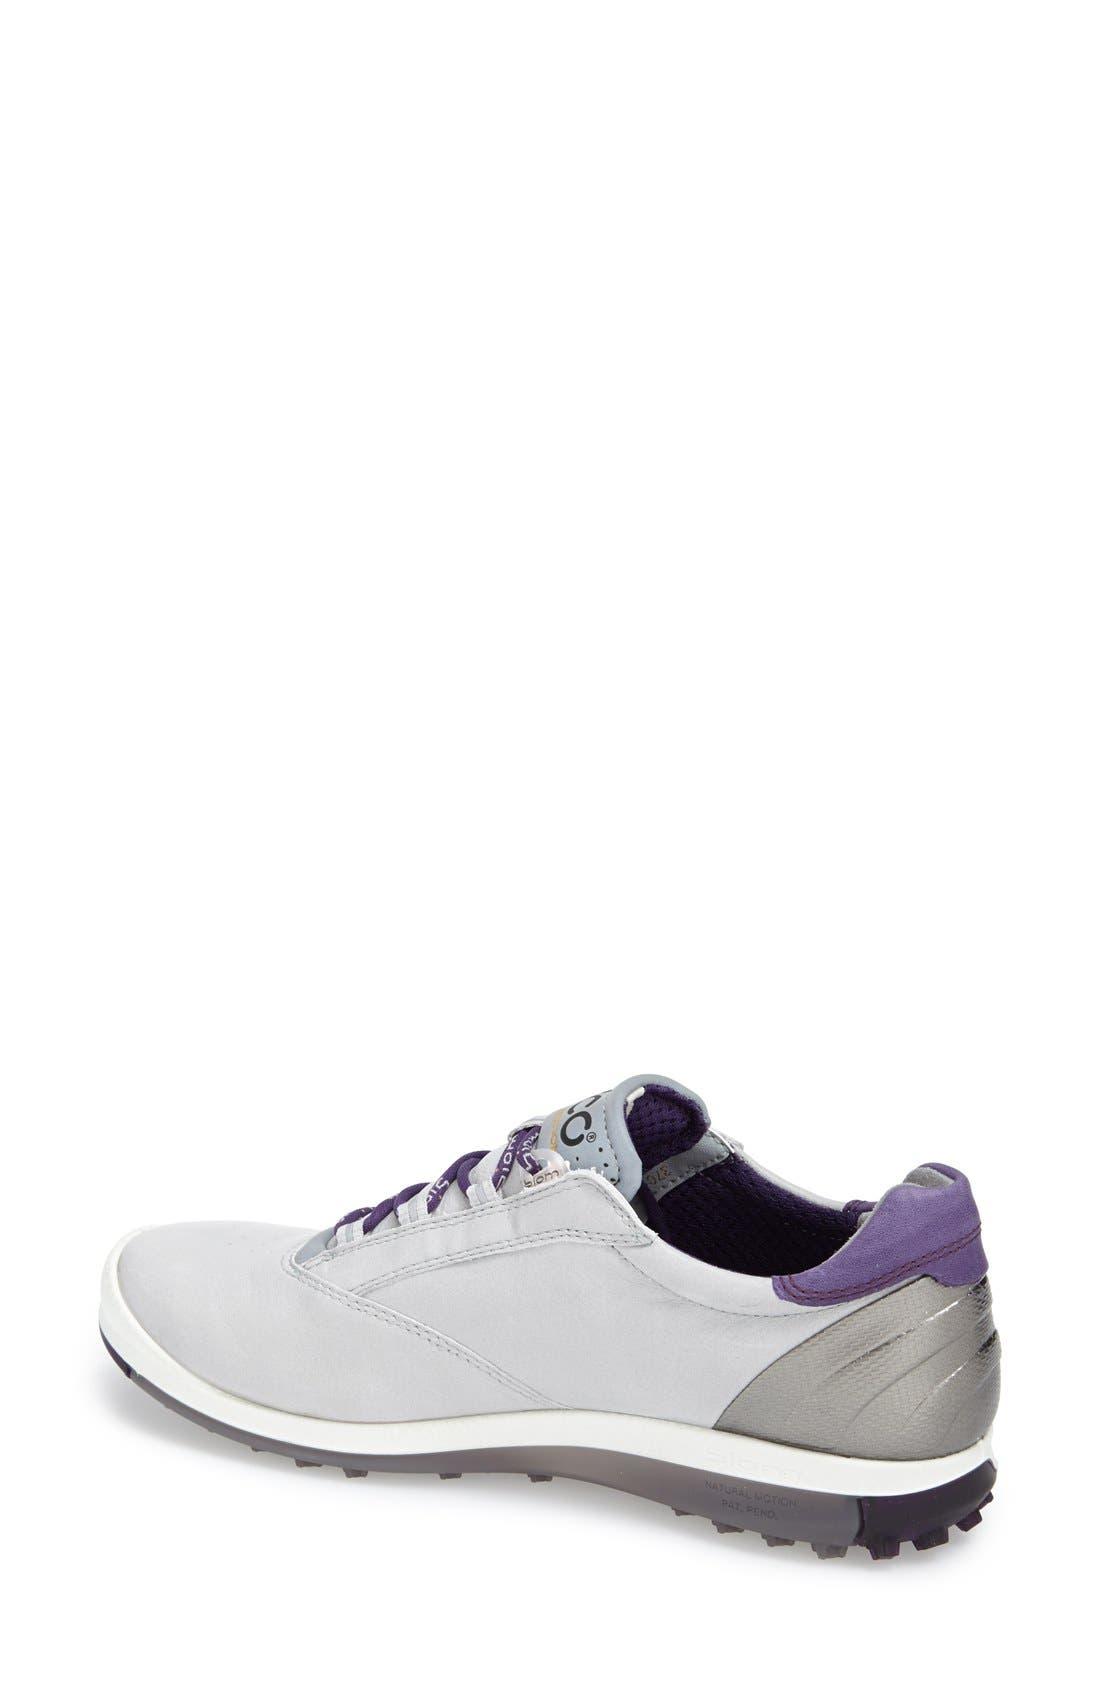 'BIOM' Hydromax<sup>®</sup> Waterproof Golf Shoe,                             Alternate thumbnail 18, color,